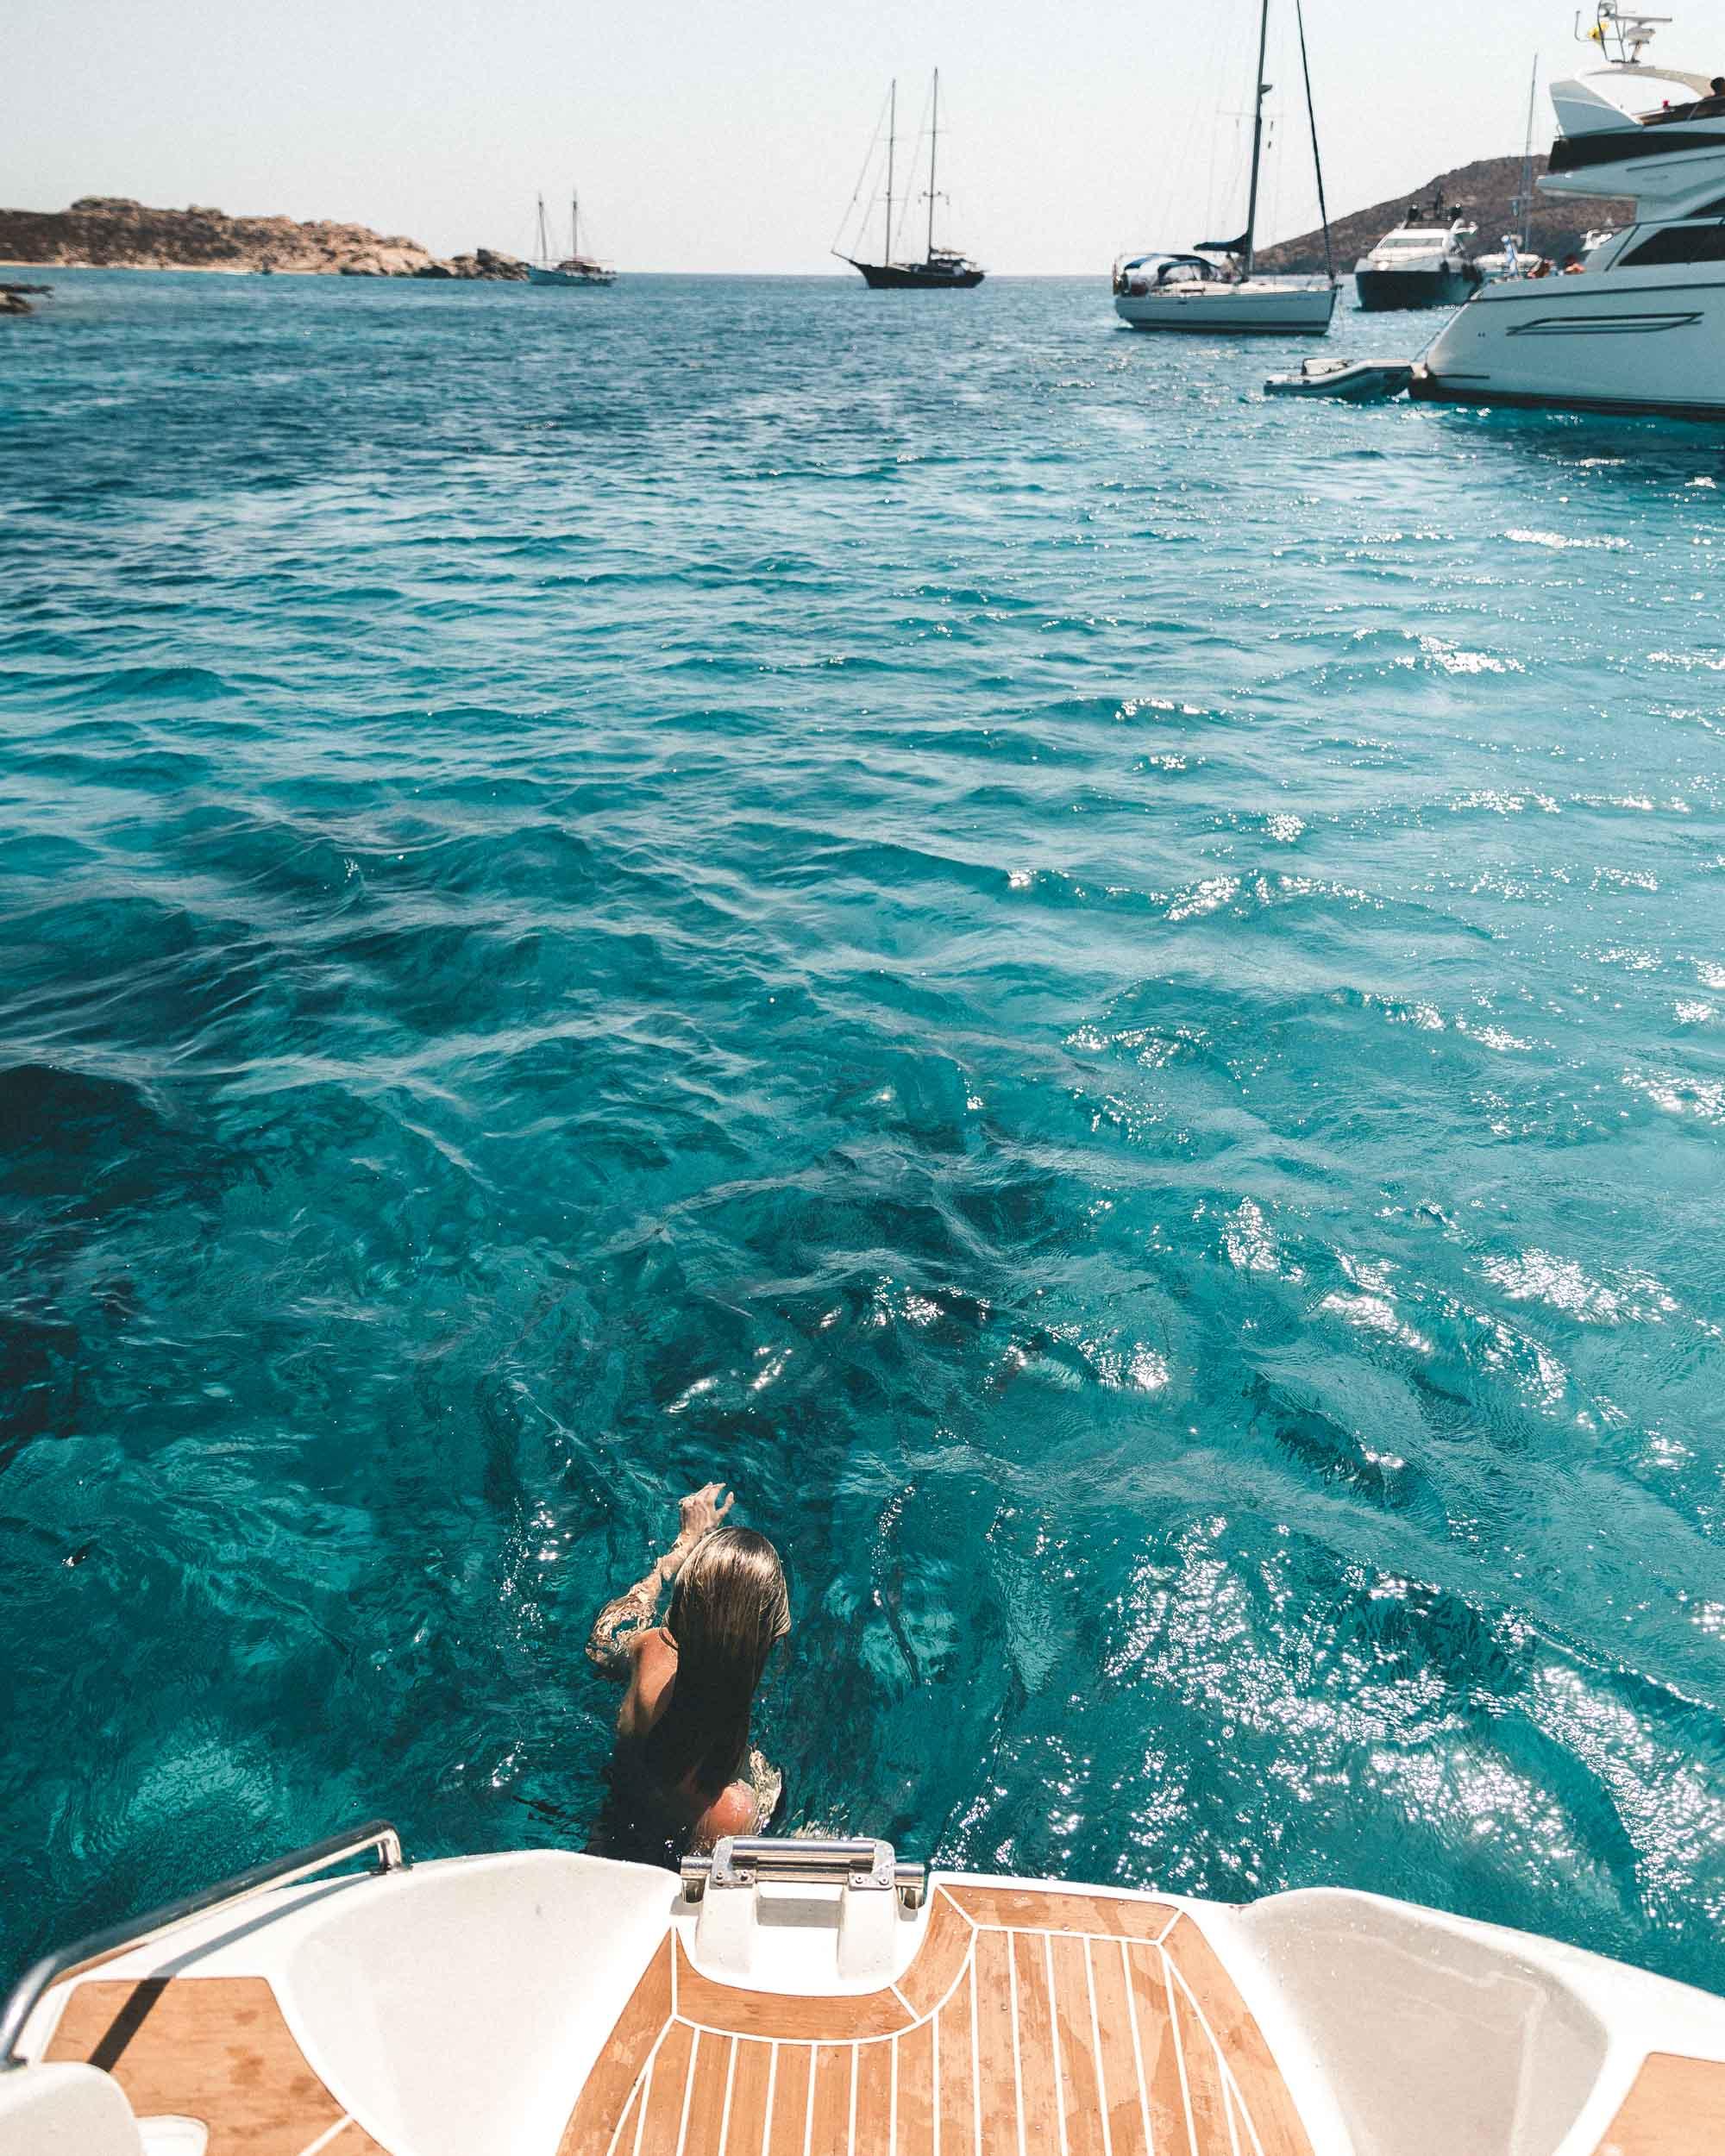 Swimming in the clear blue water in the mediterranean sea mykonos in the greek islands